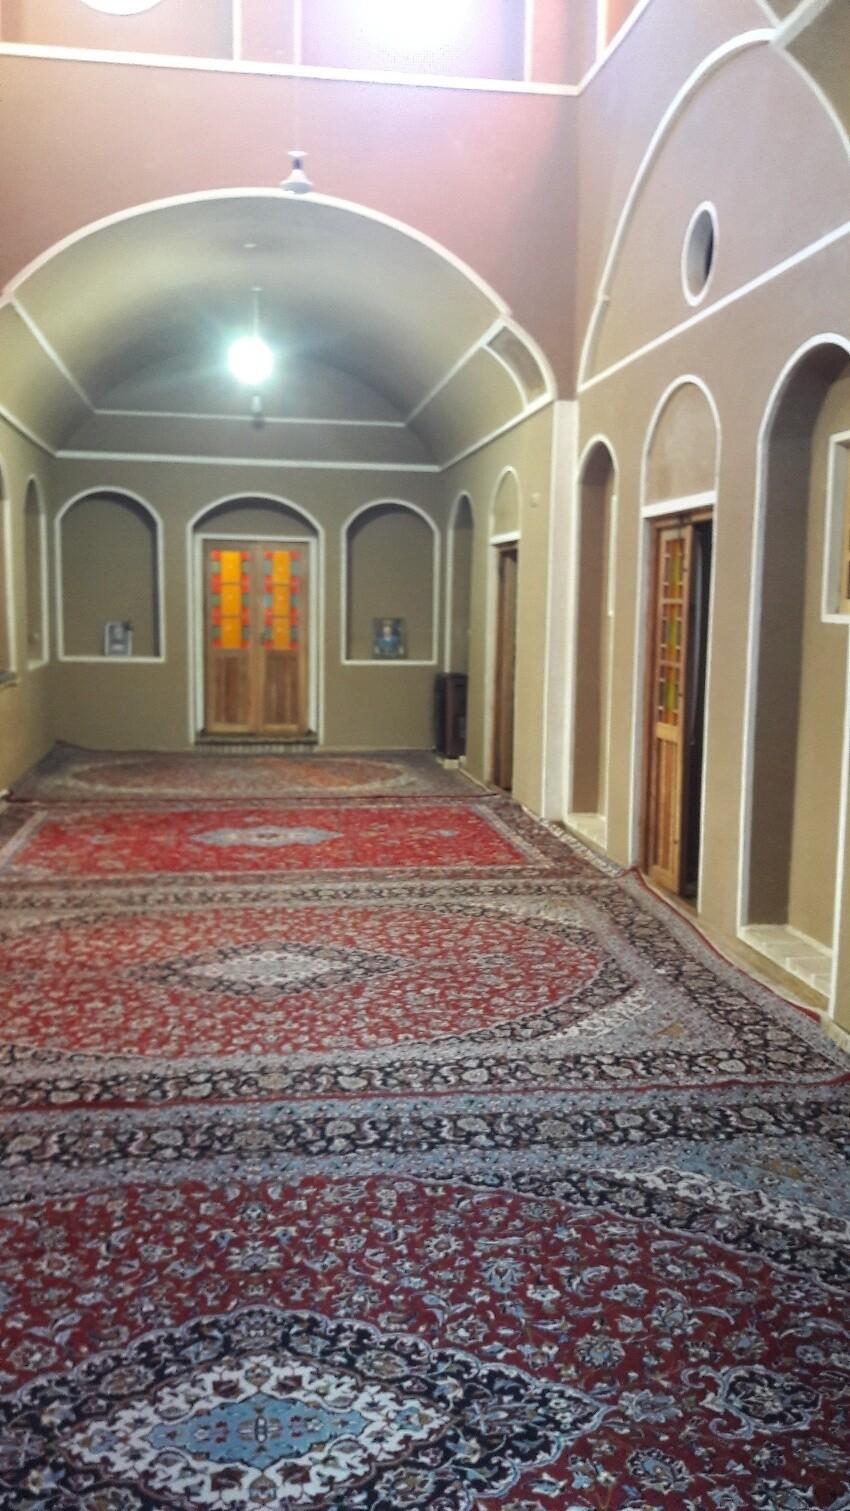 Haj Hossein Abuzid Ecological Residence in Kashan (1).jpeg